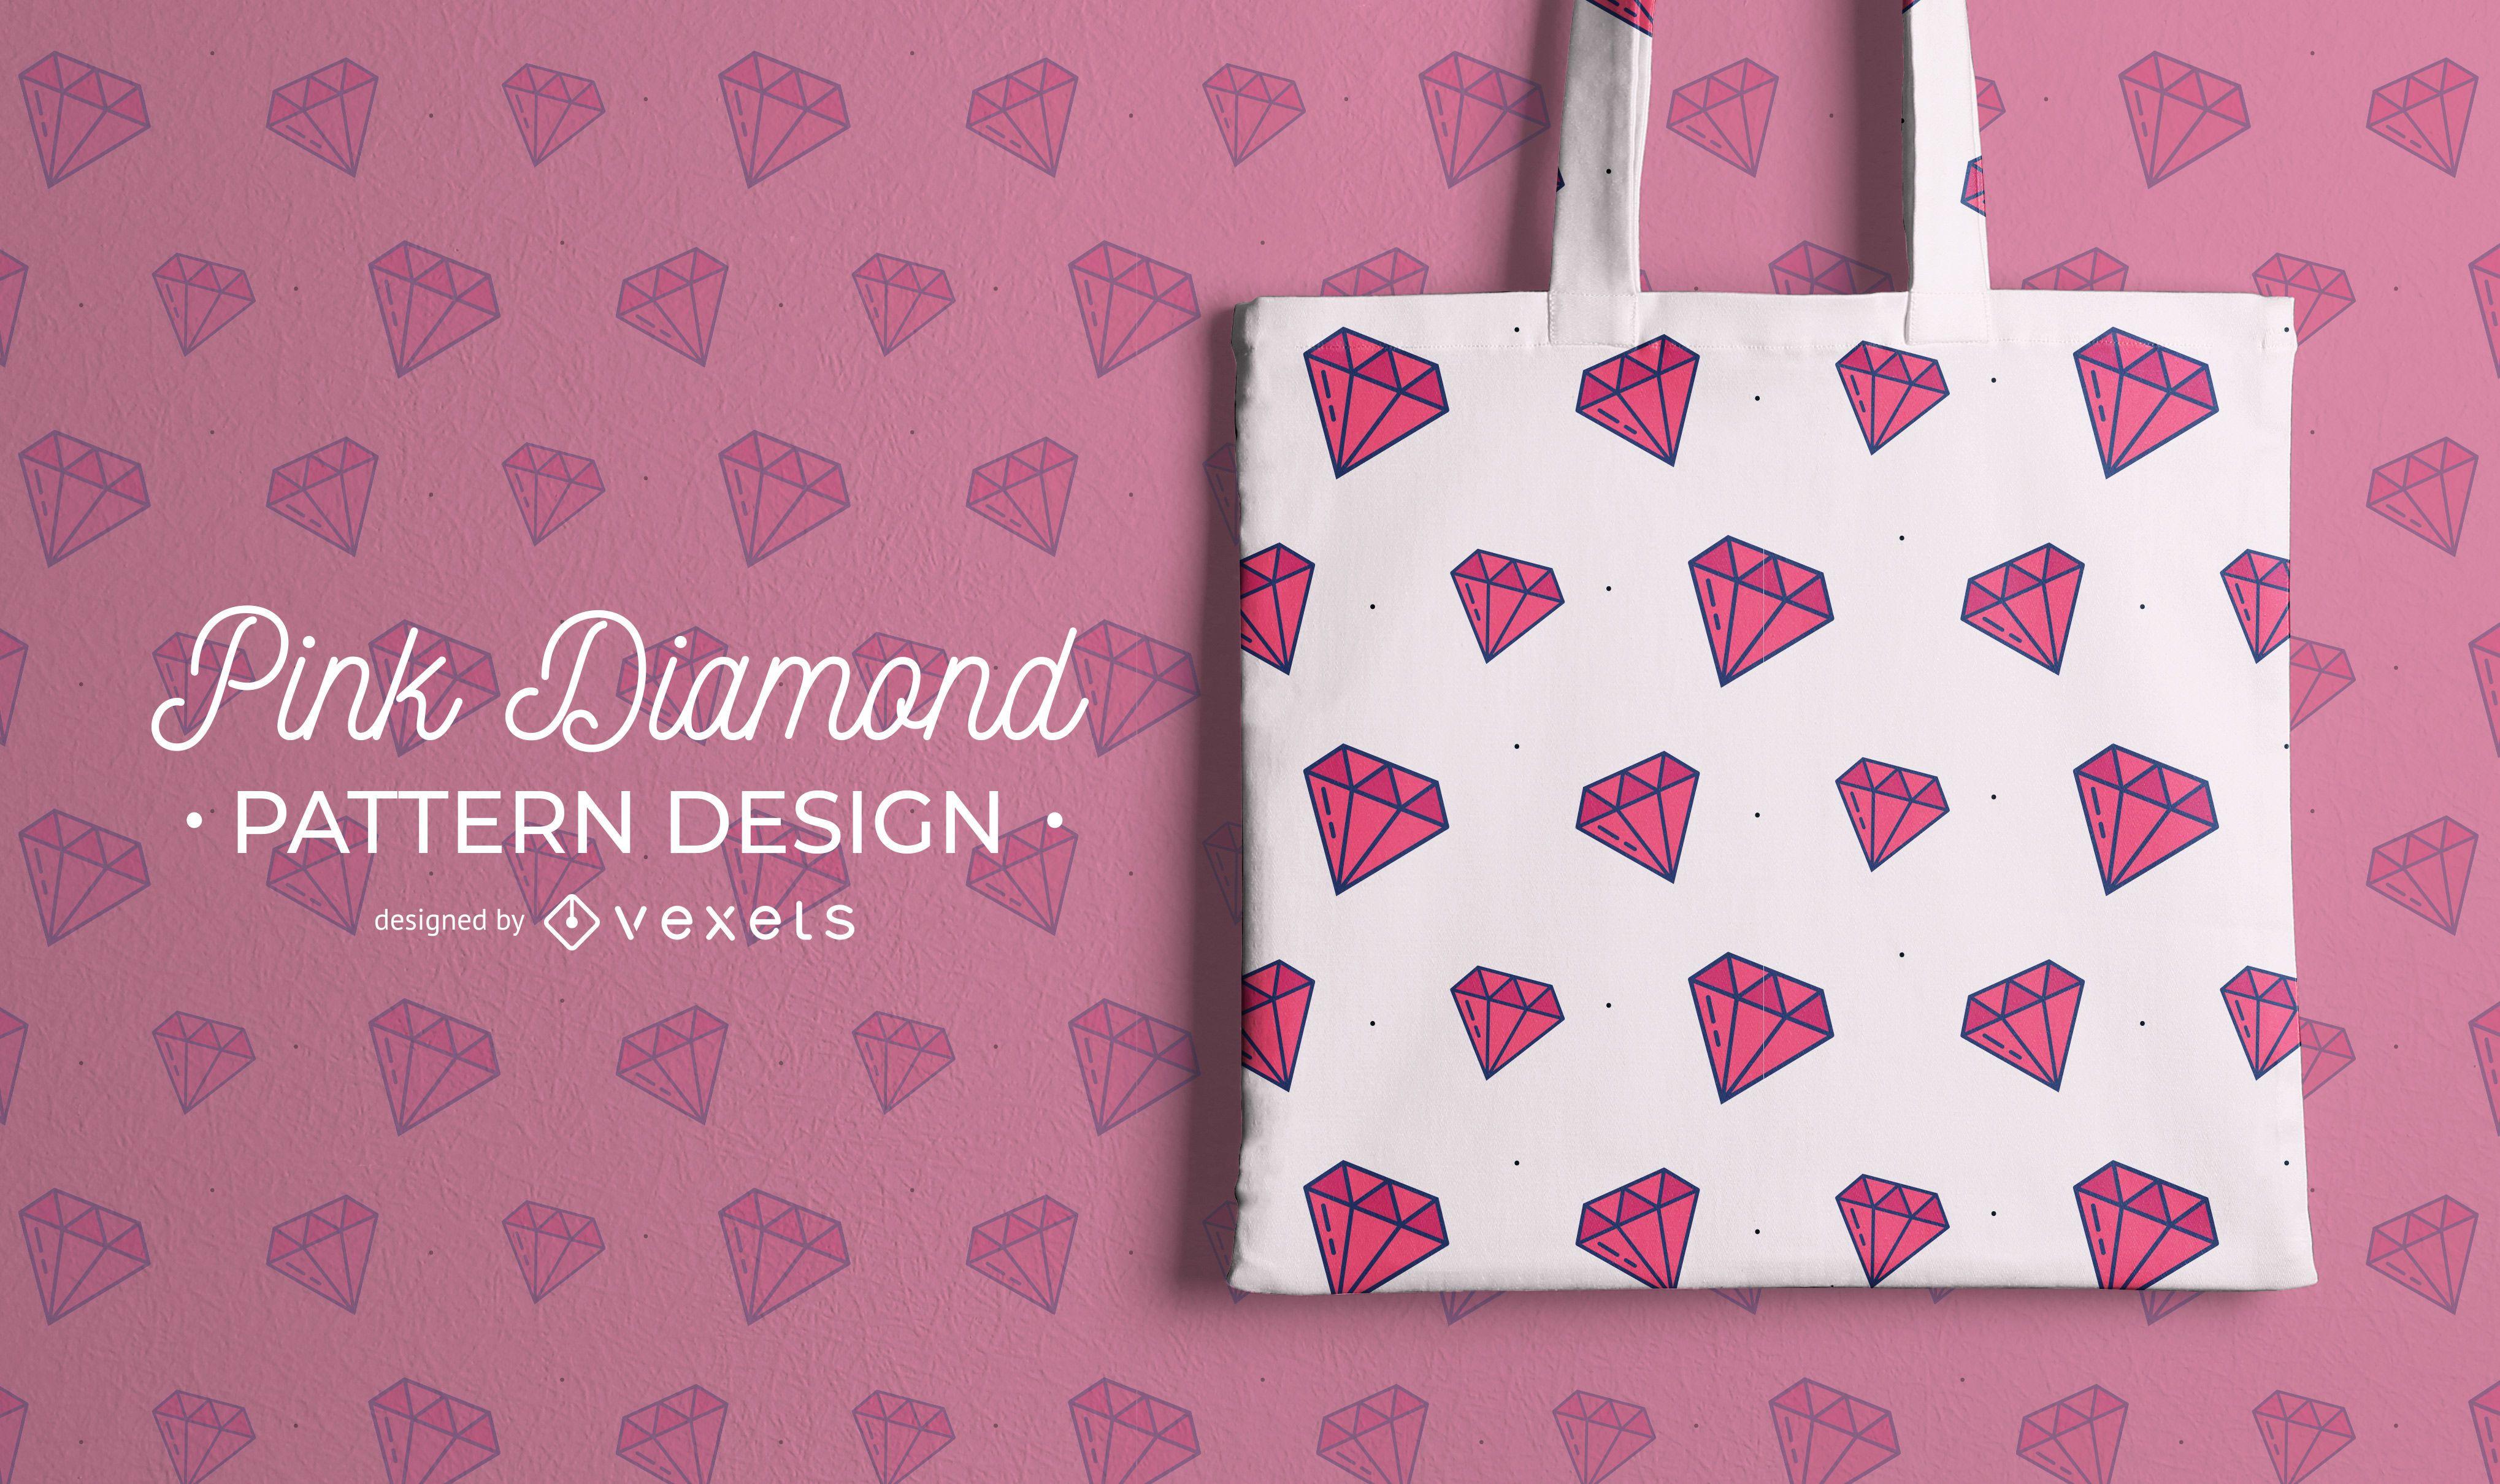 Pink diamond pattern design